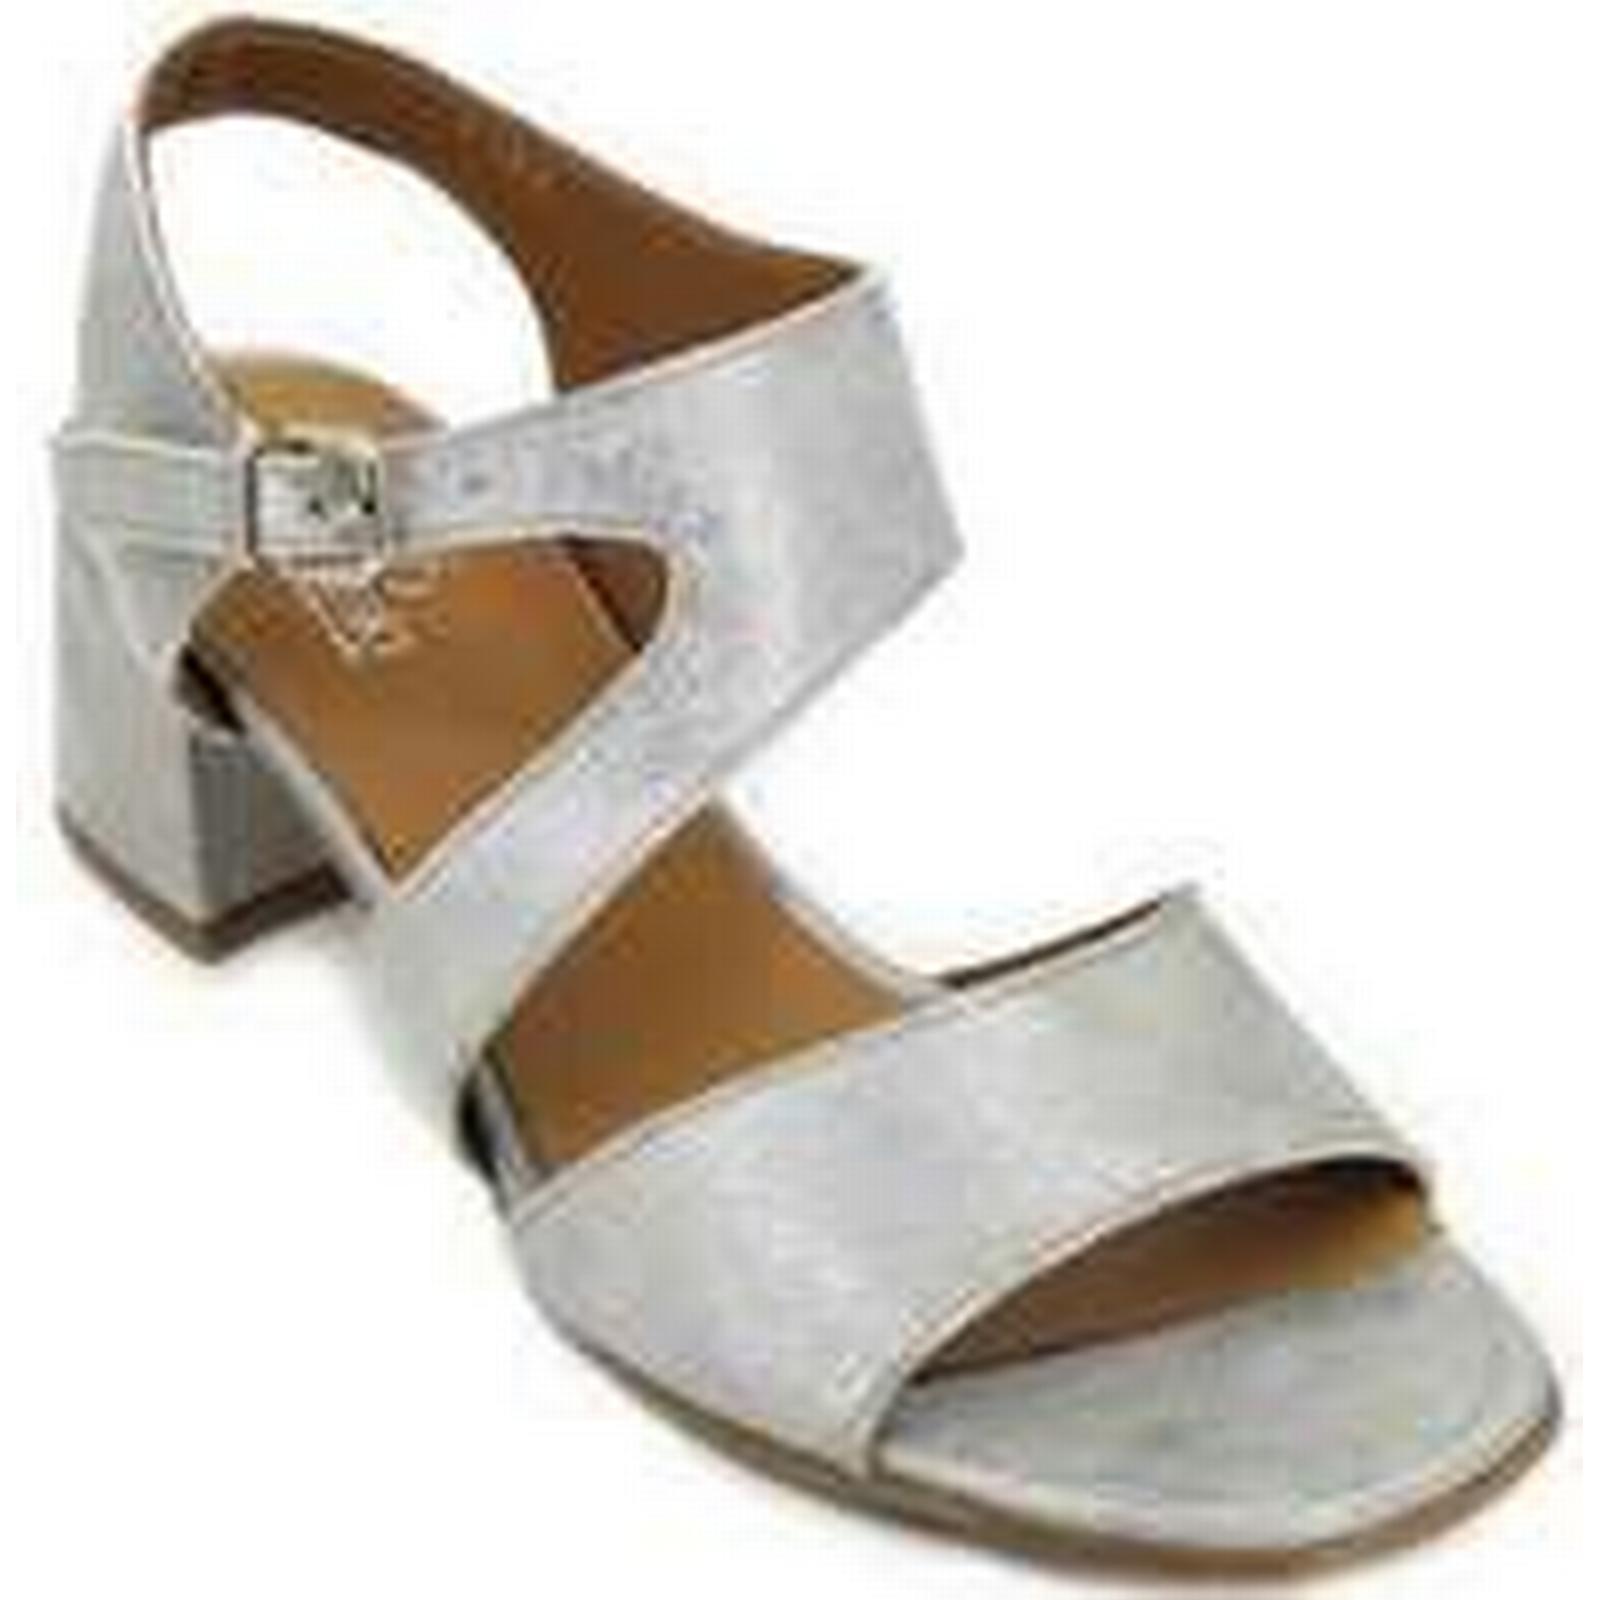 Spartoo.co.uk Sandals Luis Gonzalo 4184M Women's Sandals Spartoo.co.uk women's Sandals in Silver c675ba